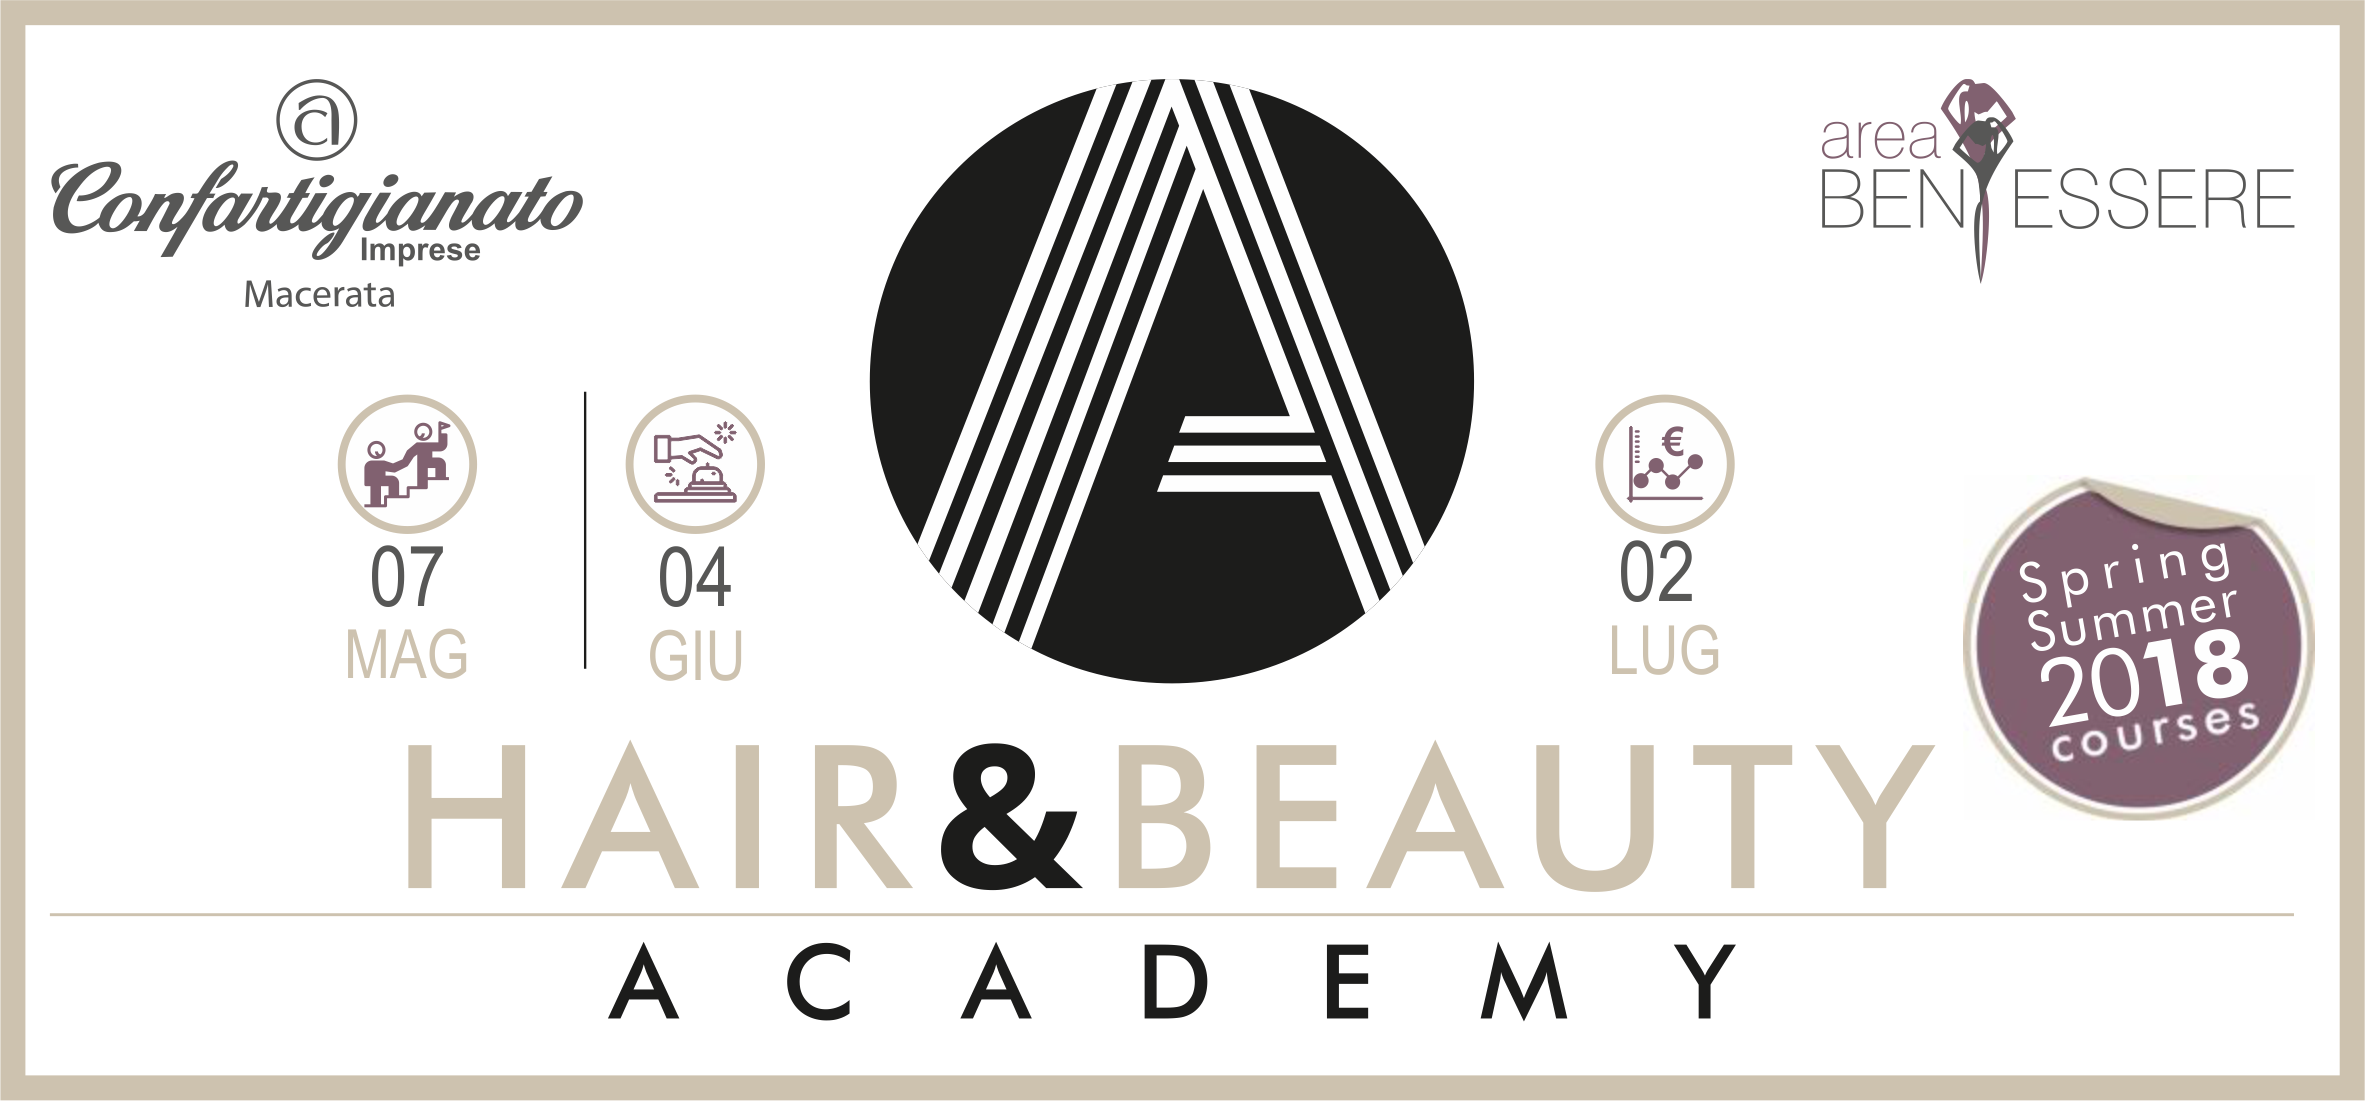 Hair&Beauty Academy Confartigianato Benessere